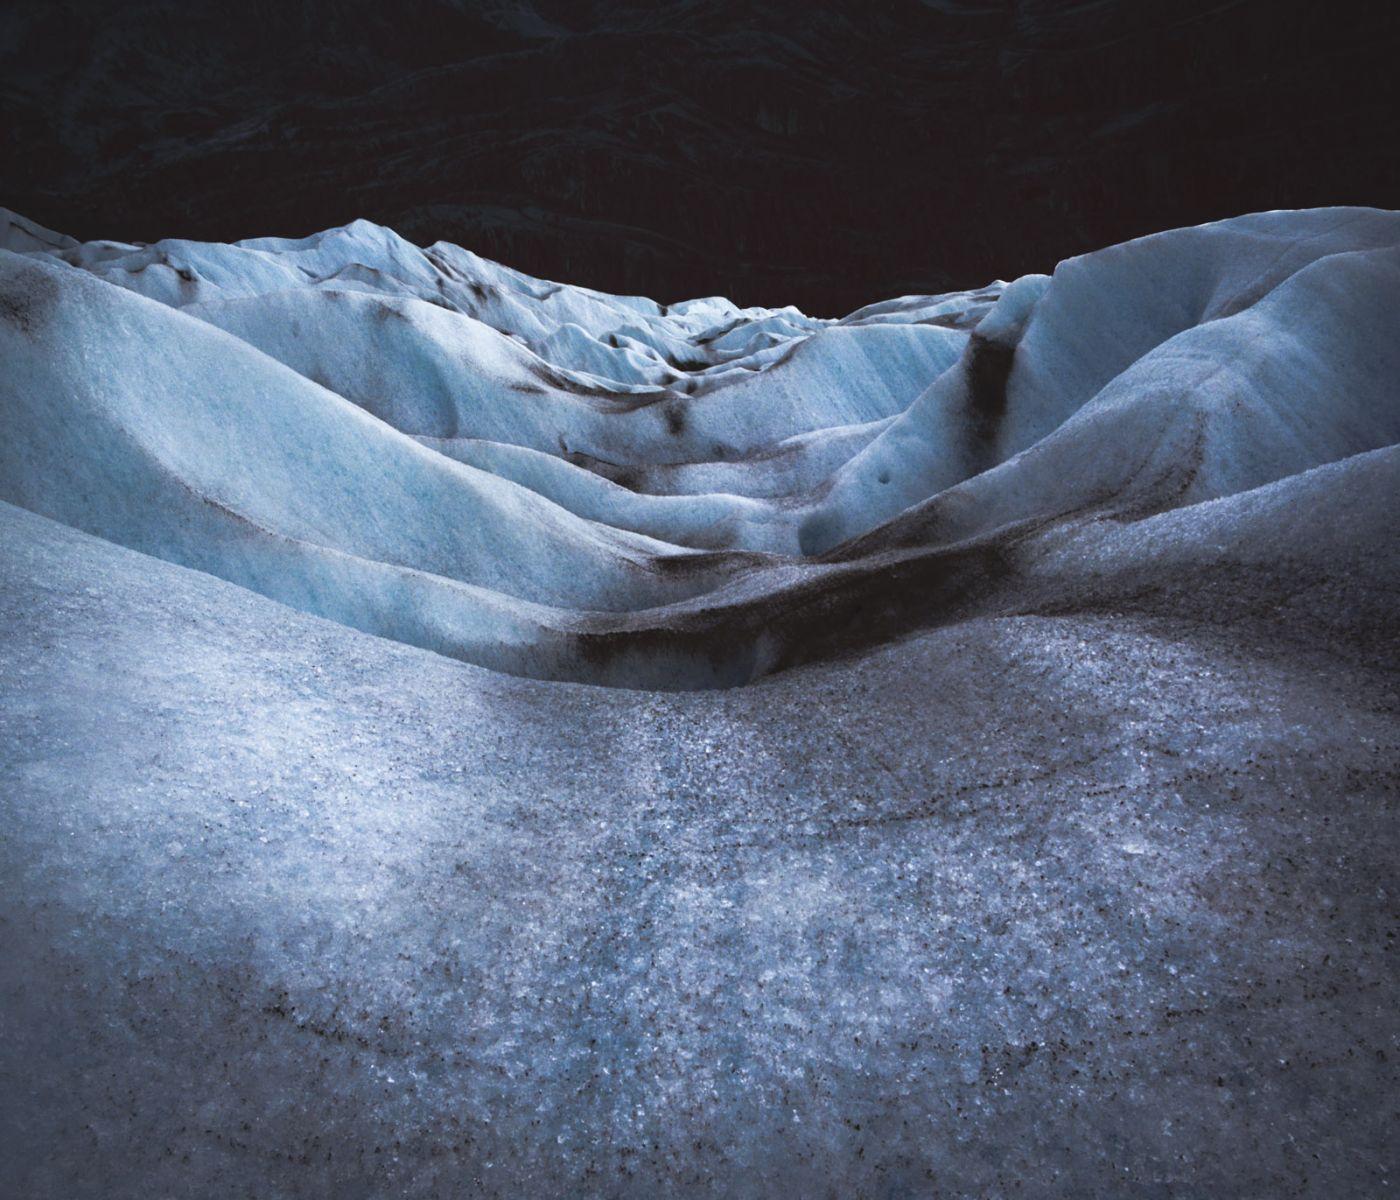 patagonia-ultima-esperanza-09